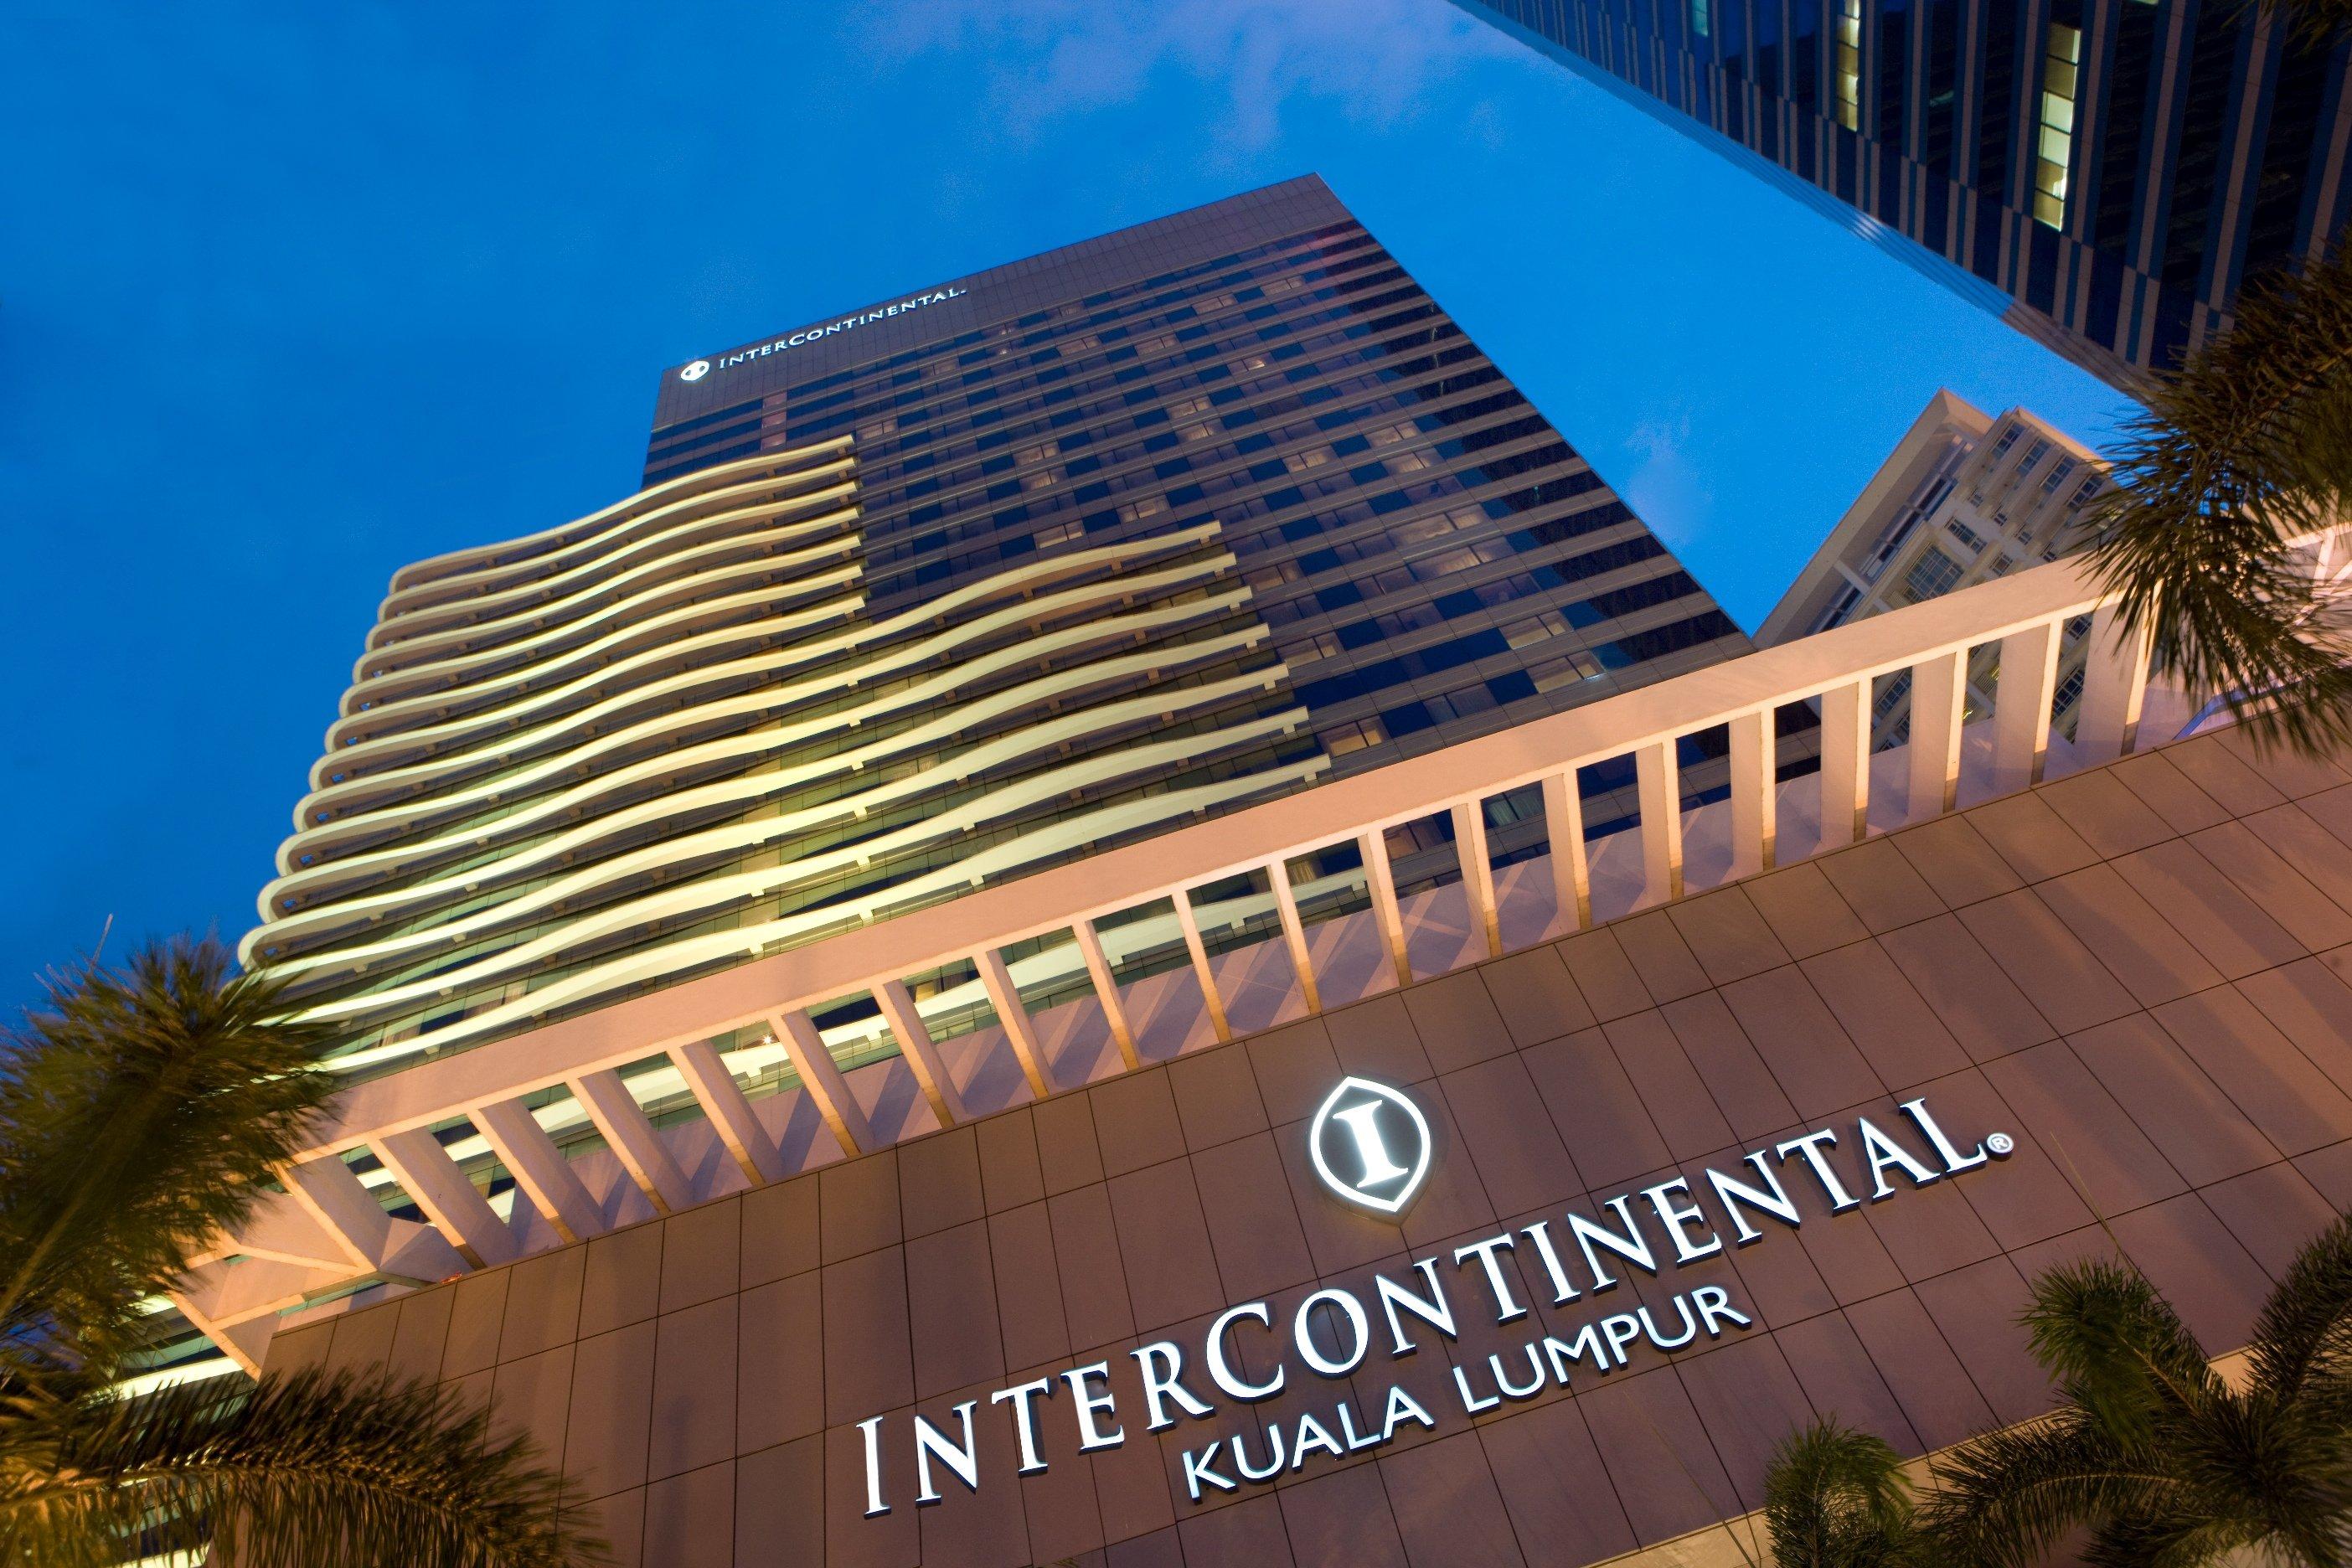 Intercontinental Kuala Lumpur Kuala Lumpur Malaysia Meeting Rooms Event Space Northstar Meetings Group